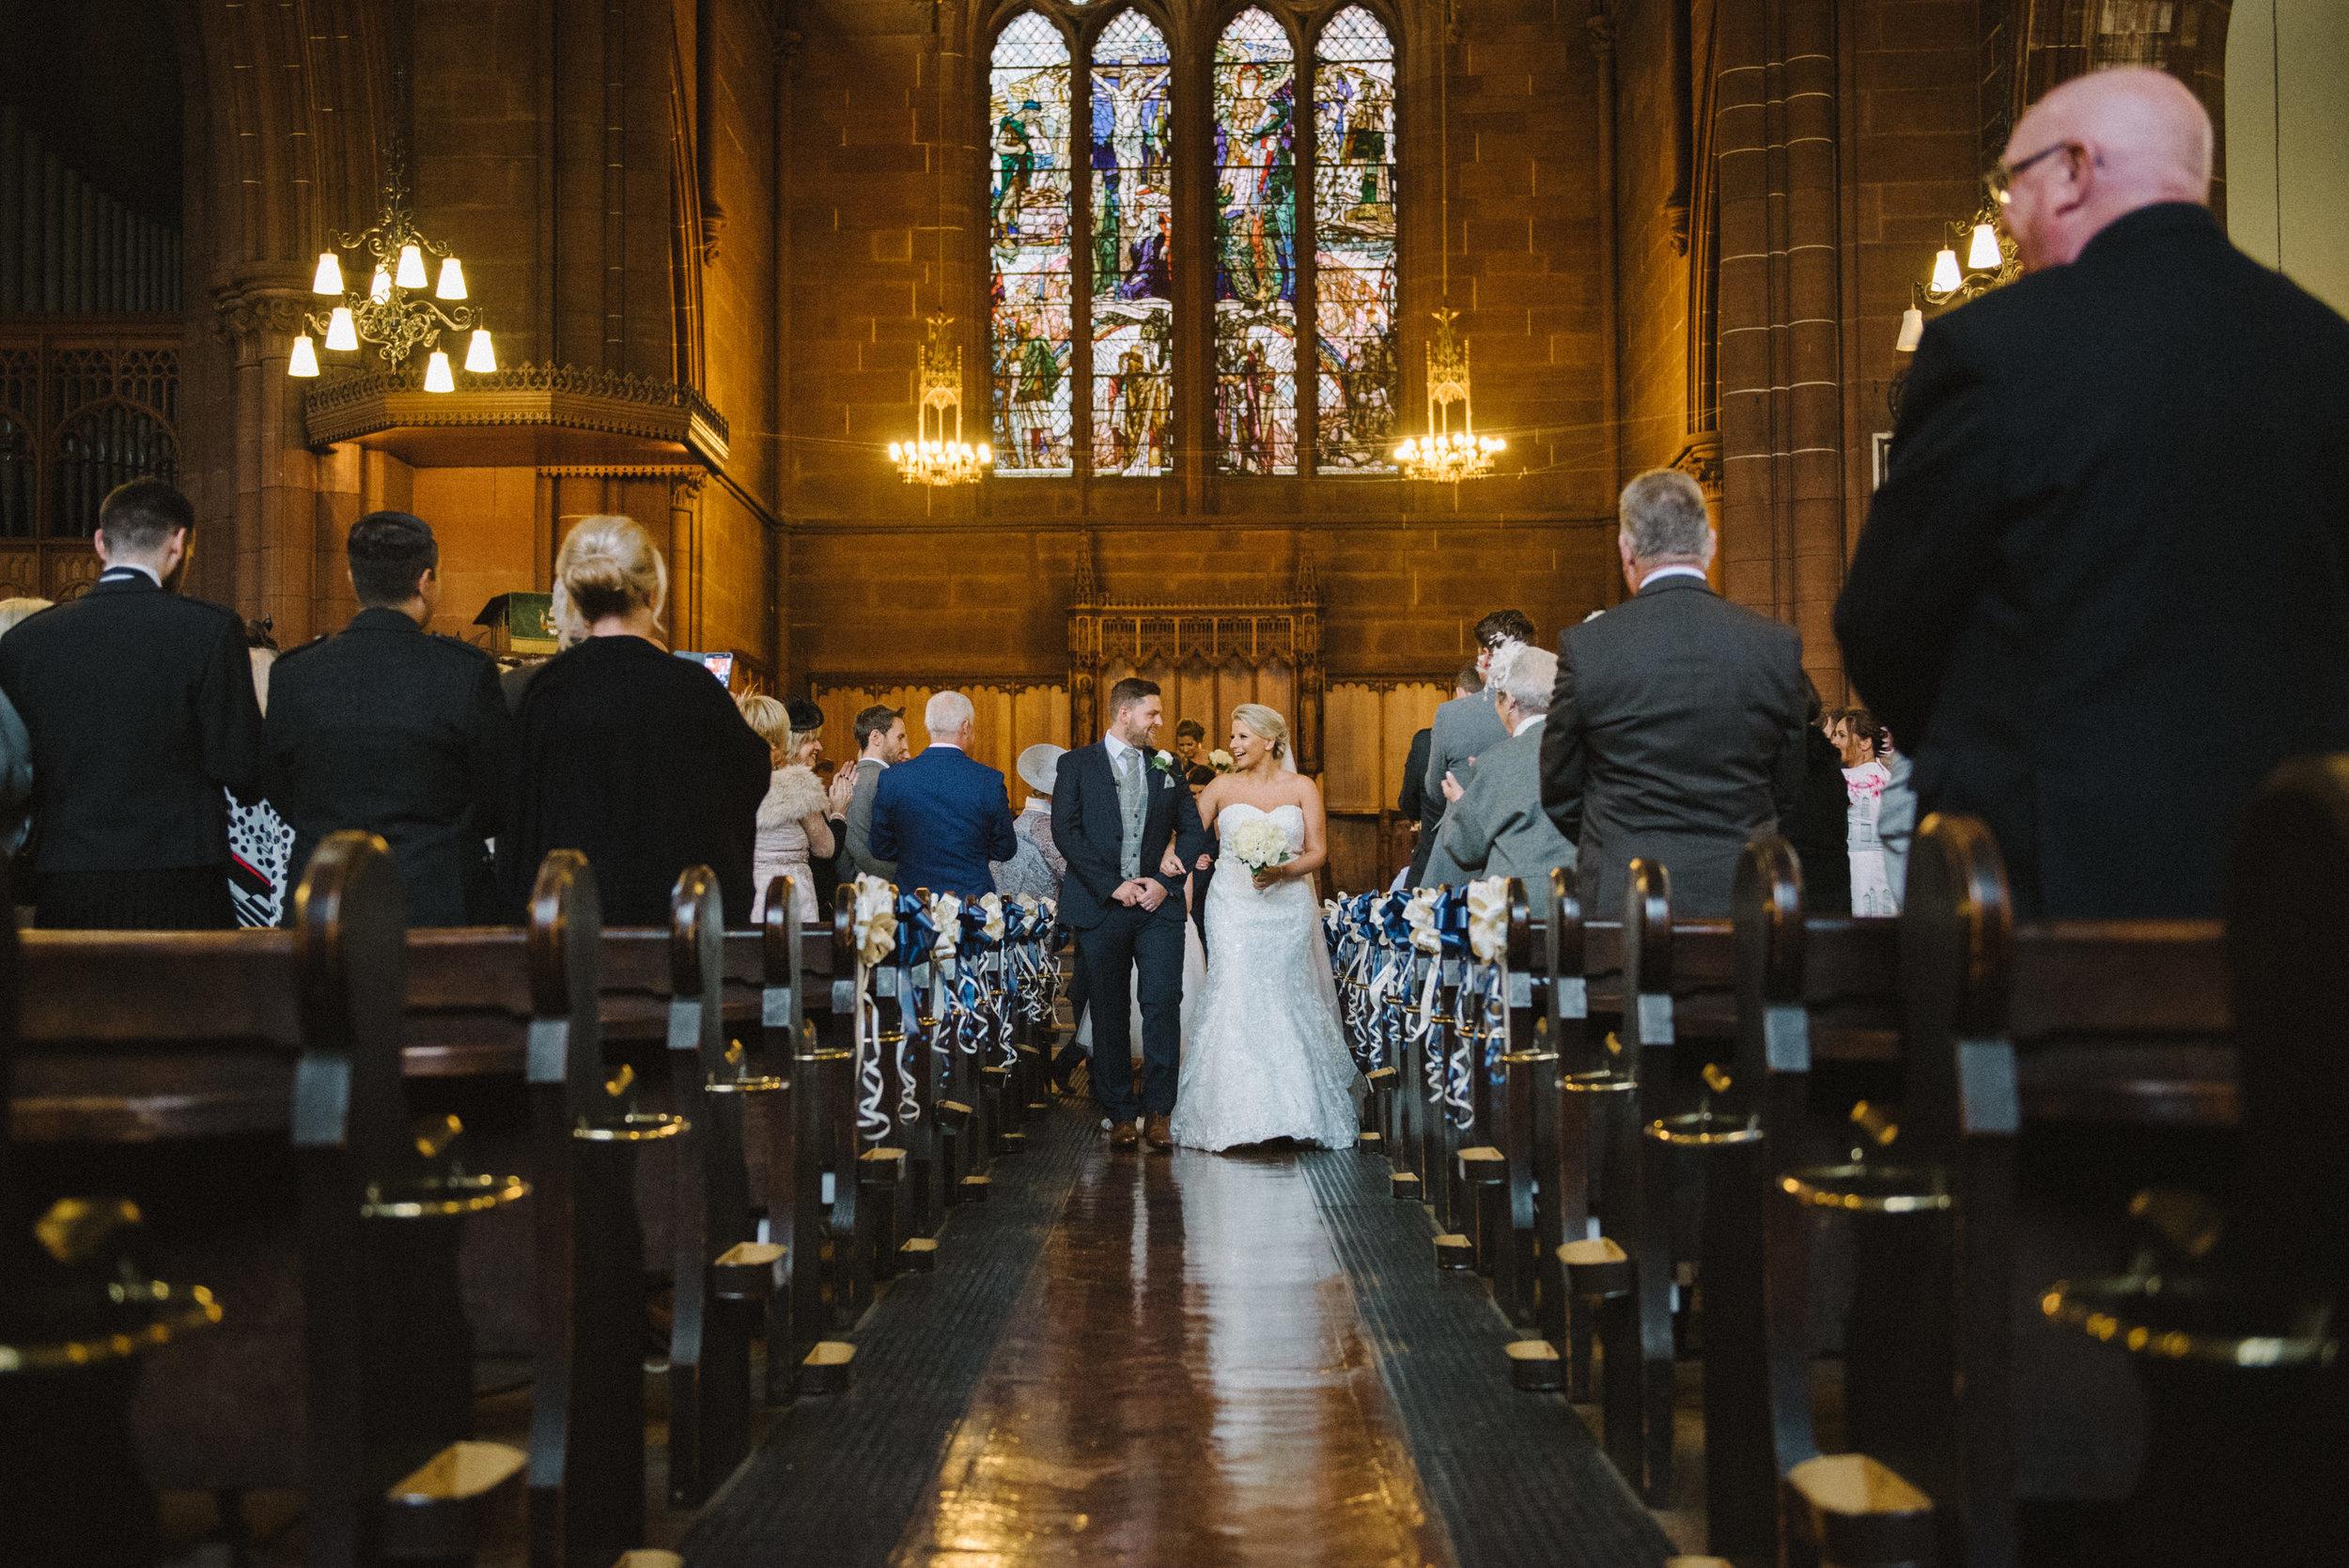 0205-LISA-DEVINE-PHOTOGRAPHY-ALTERNATIVE-WEDDING-PHOTOGRAPHY-SCOTLAND-DESTINATION-WEDDINGS-GLASGOW-WEDDINGS-COOL-WEDDINGS-STYLISH-WEDDINGS.JPG